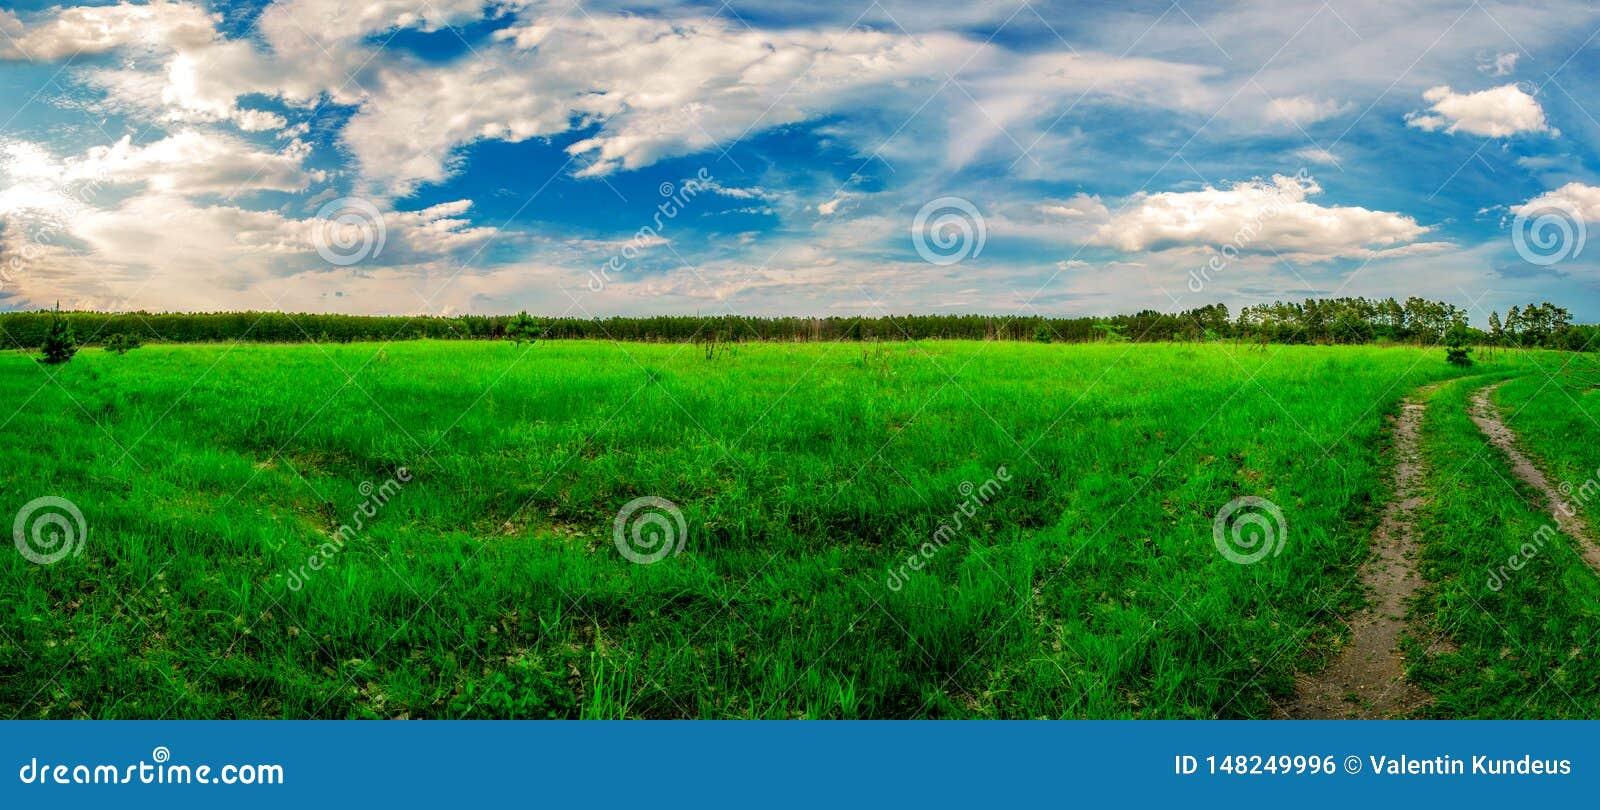 R Τομέας, δάσος και ουρανός r Πράσινη juicy χλόη Κωνοφόρο δάσος στον ορίζοντα Σωρείτης στον ουρανό